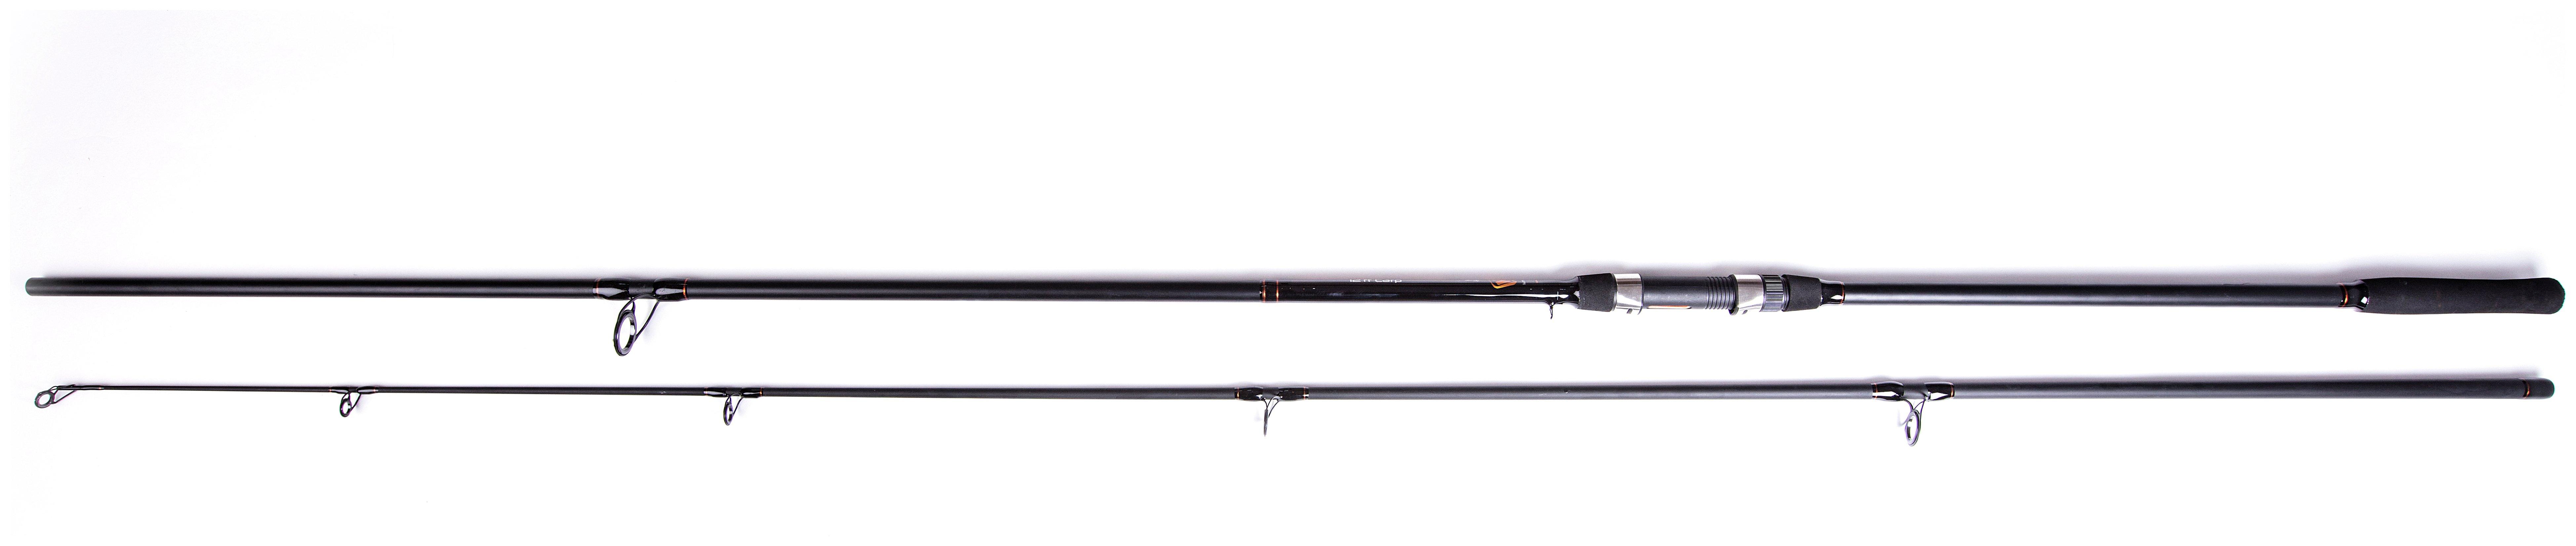 matt-hayes-adventure-36-metre-carp-fishing-rod